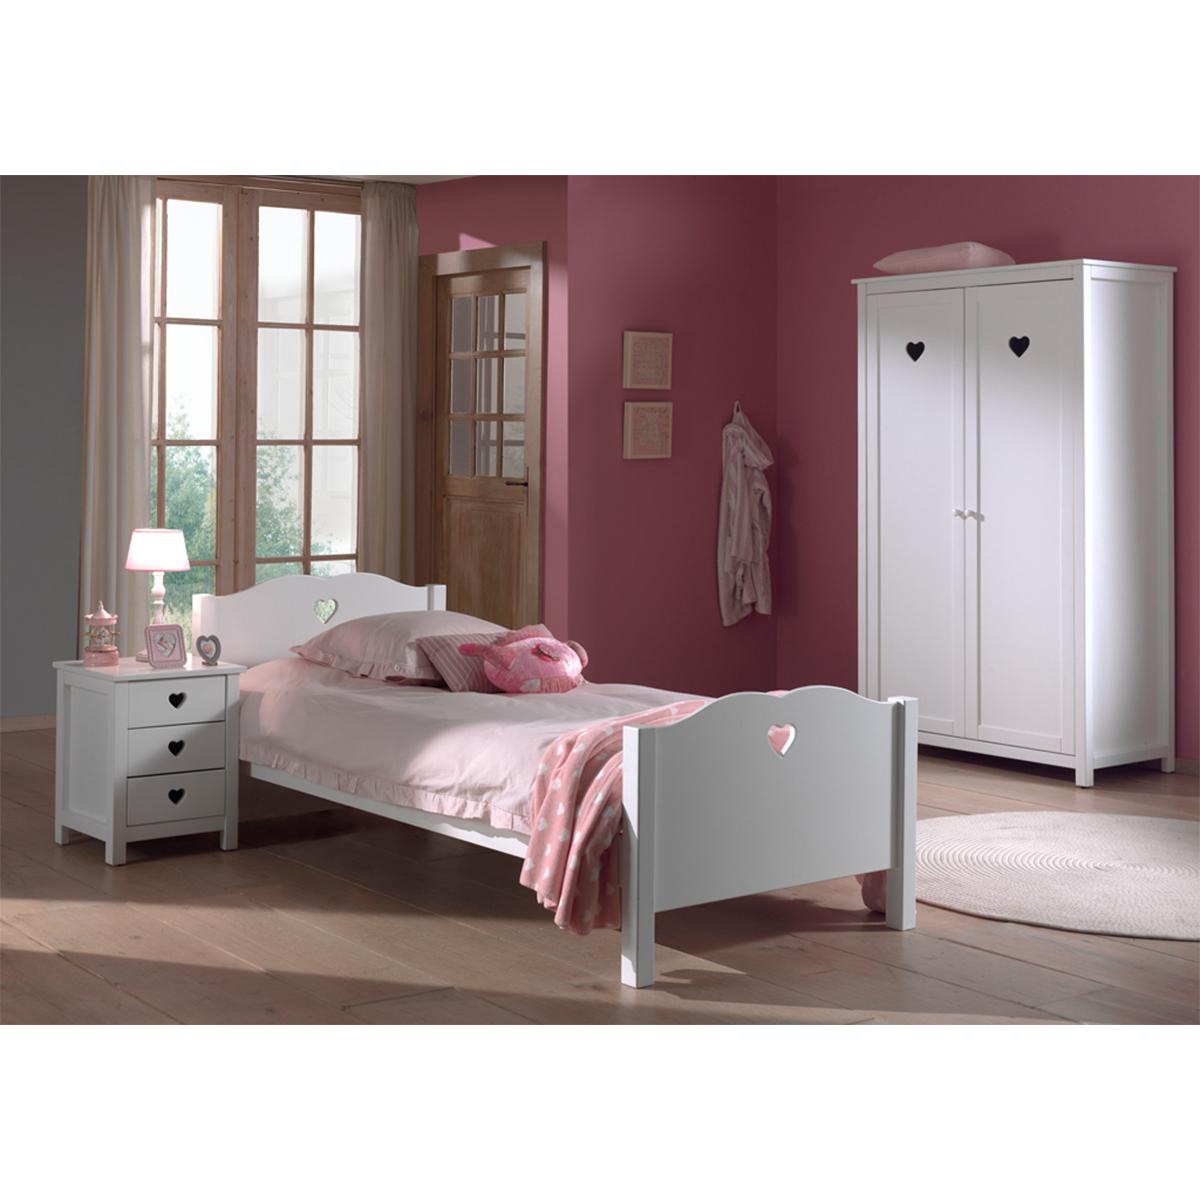 Lit 90x200 - Chevet 3 tiroirs et Armoire 2 portes Vipack Amori - Blanc